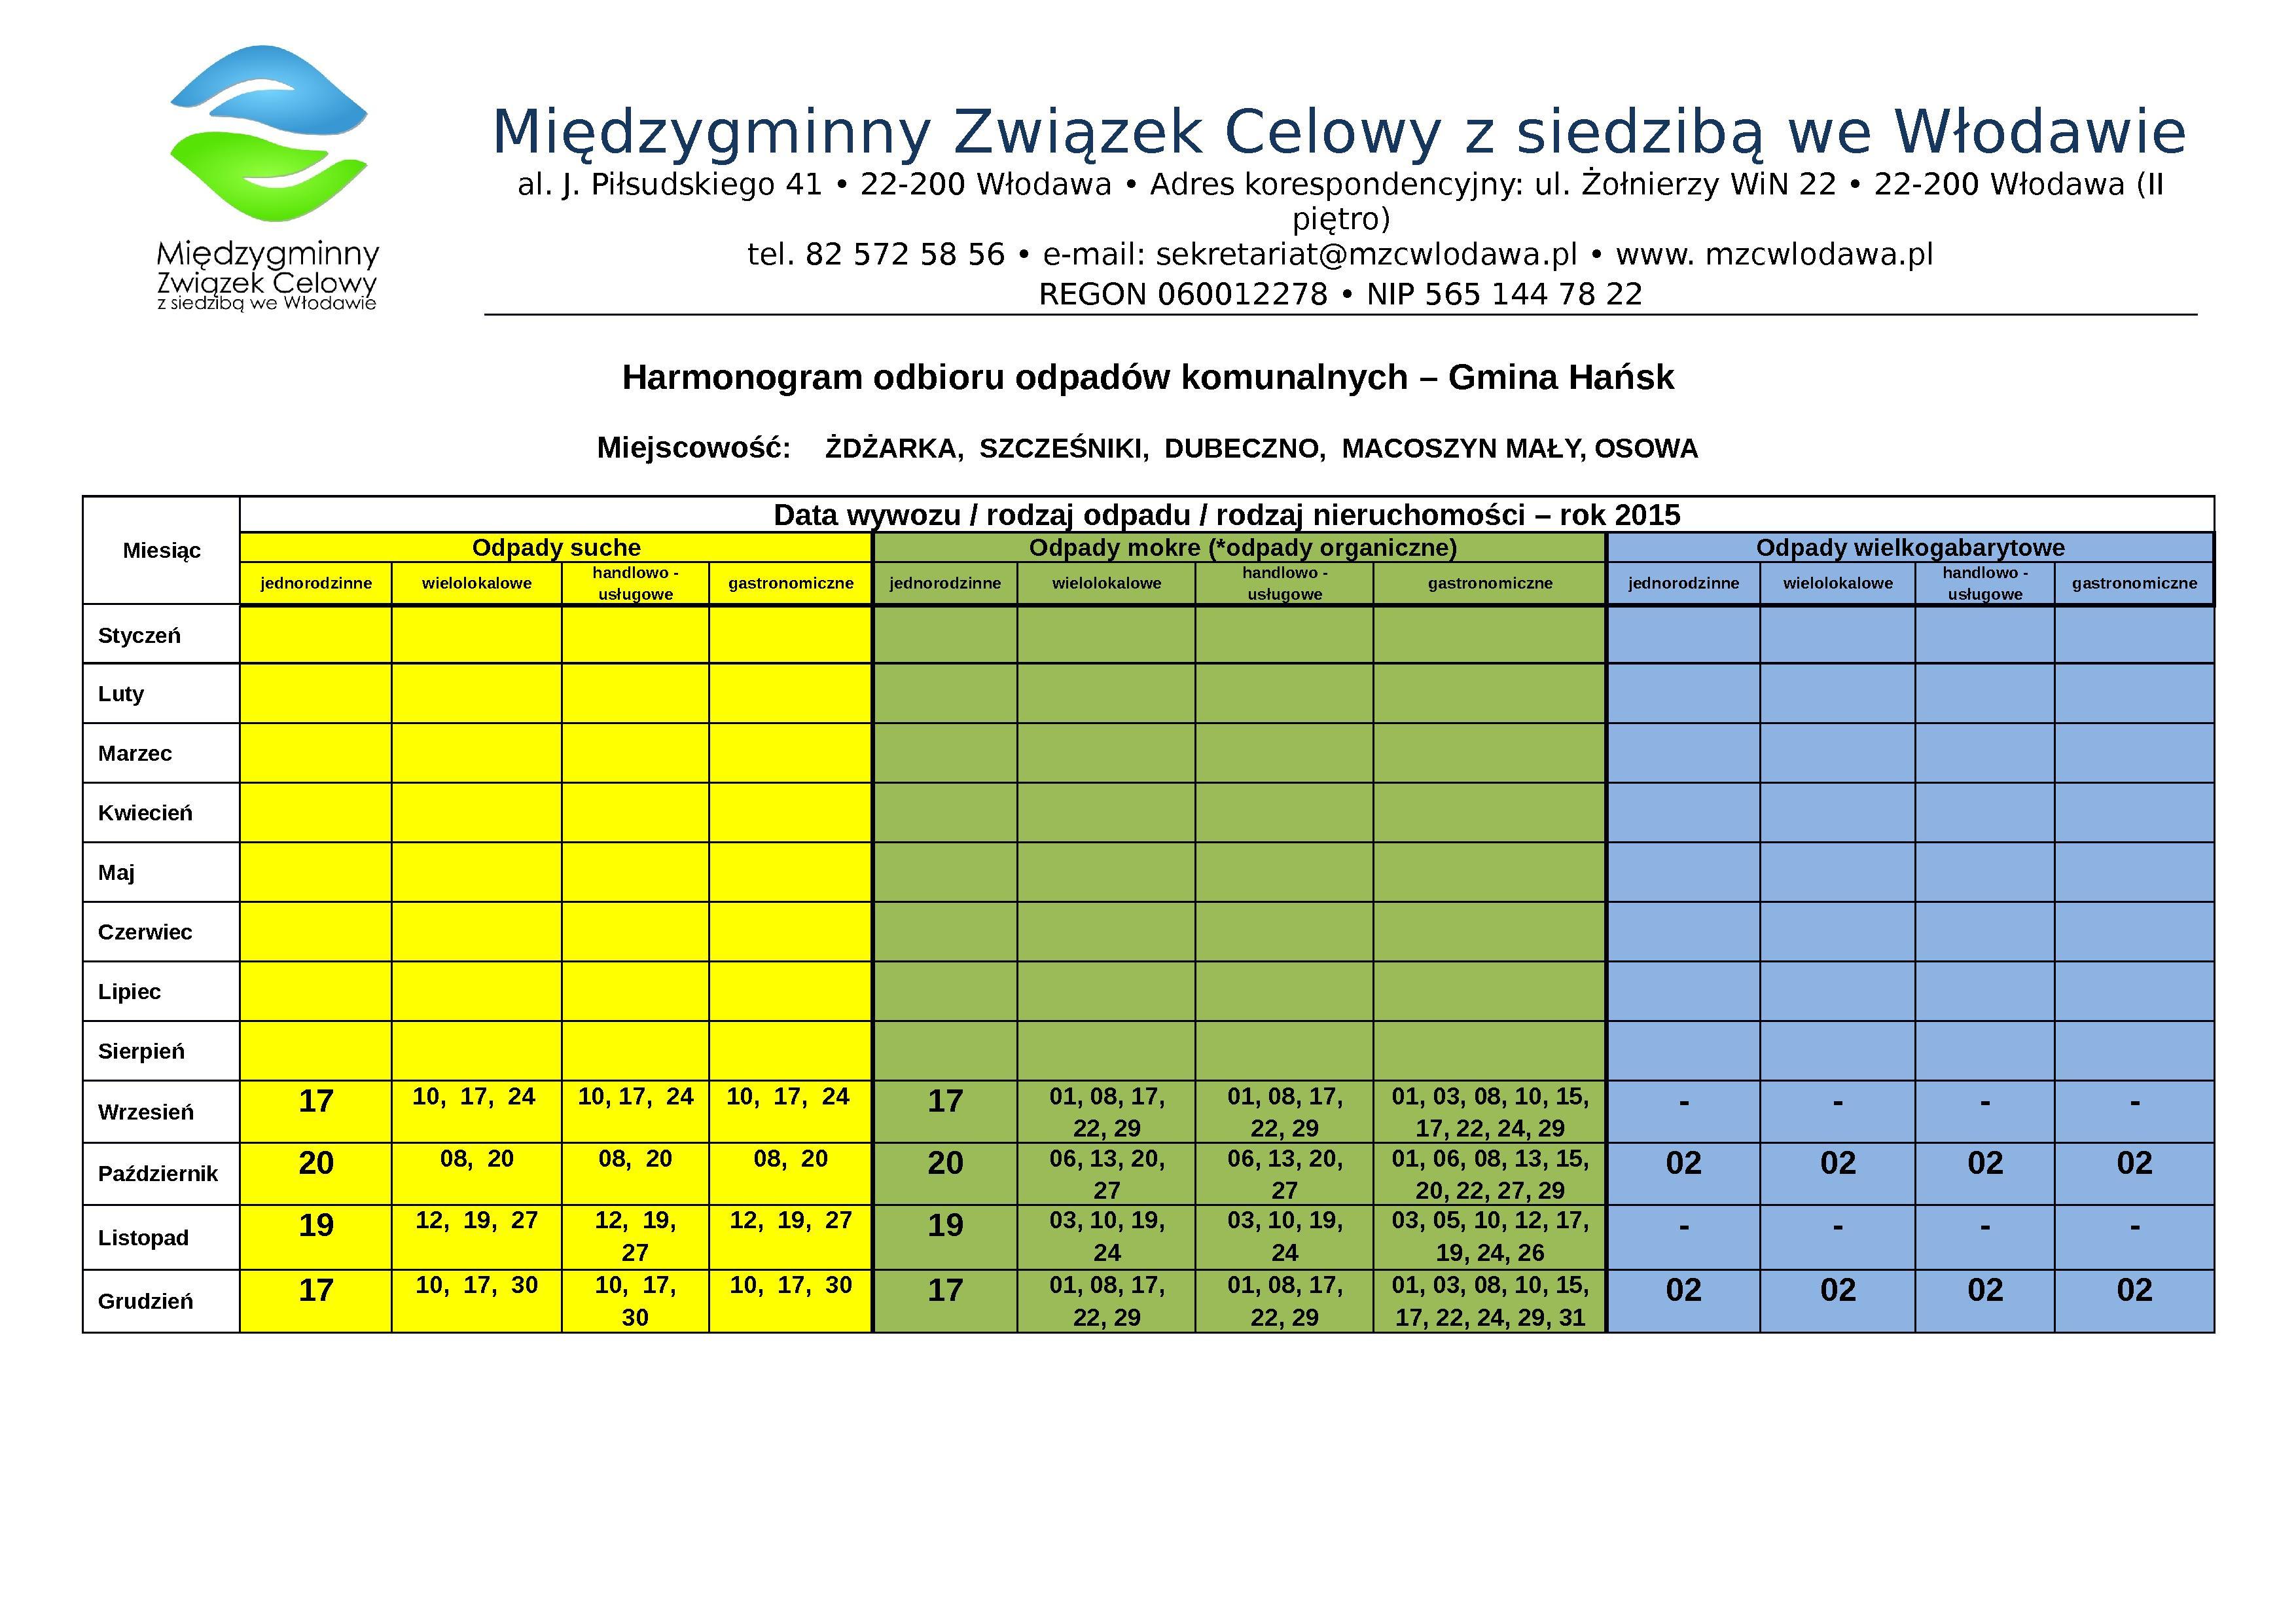 Harmonogram odb odp kom Hańsk 2.pdf.01